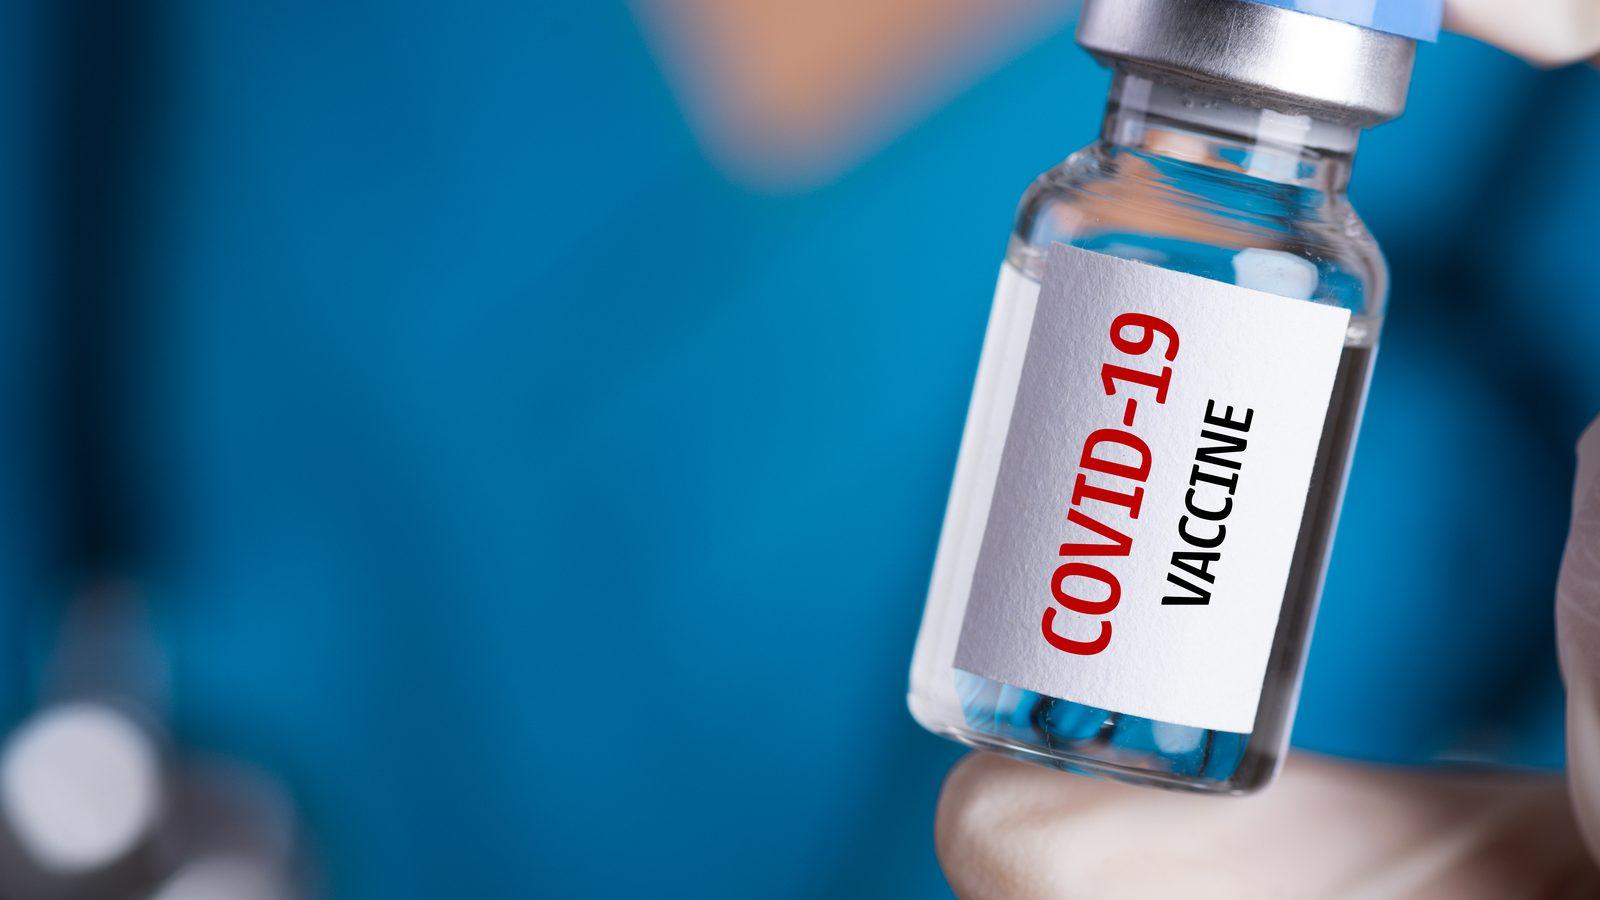 Covid-19 vaccination coverage in the country crosses 97 crore mark